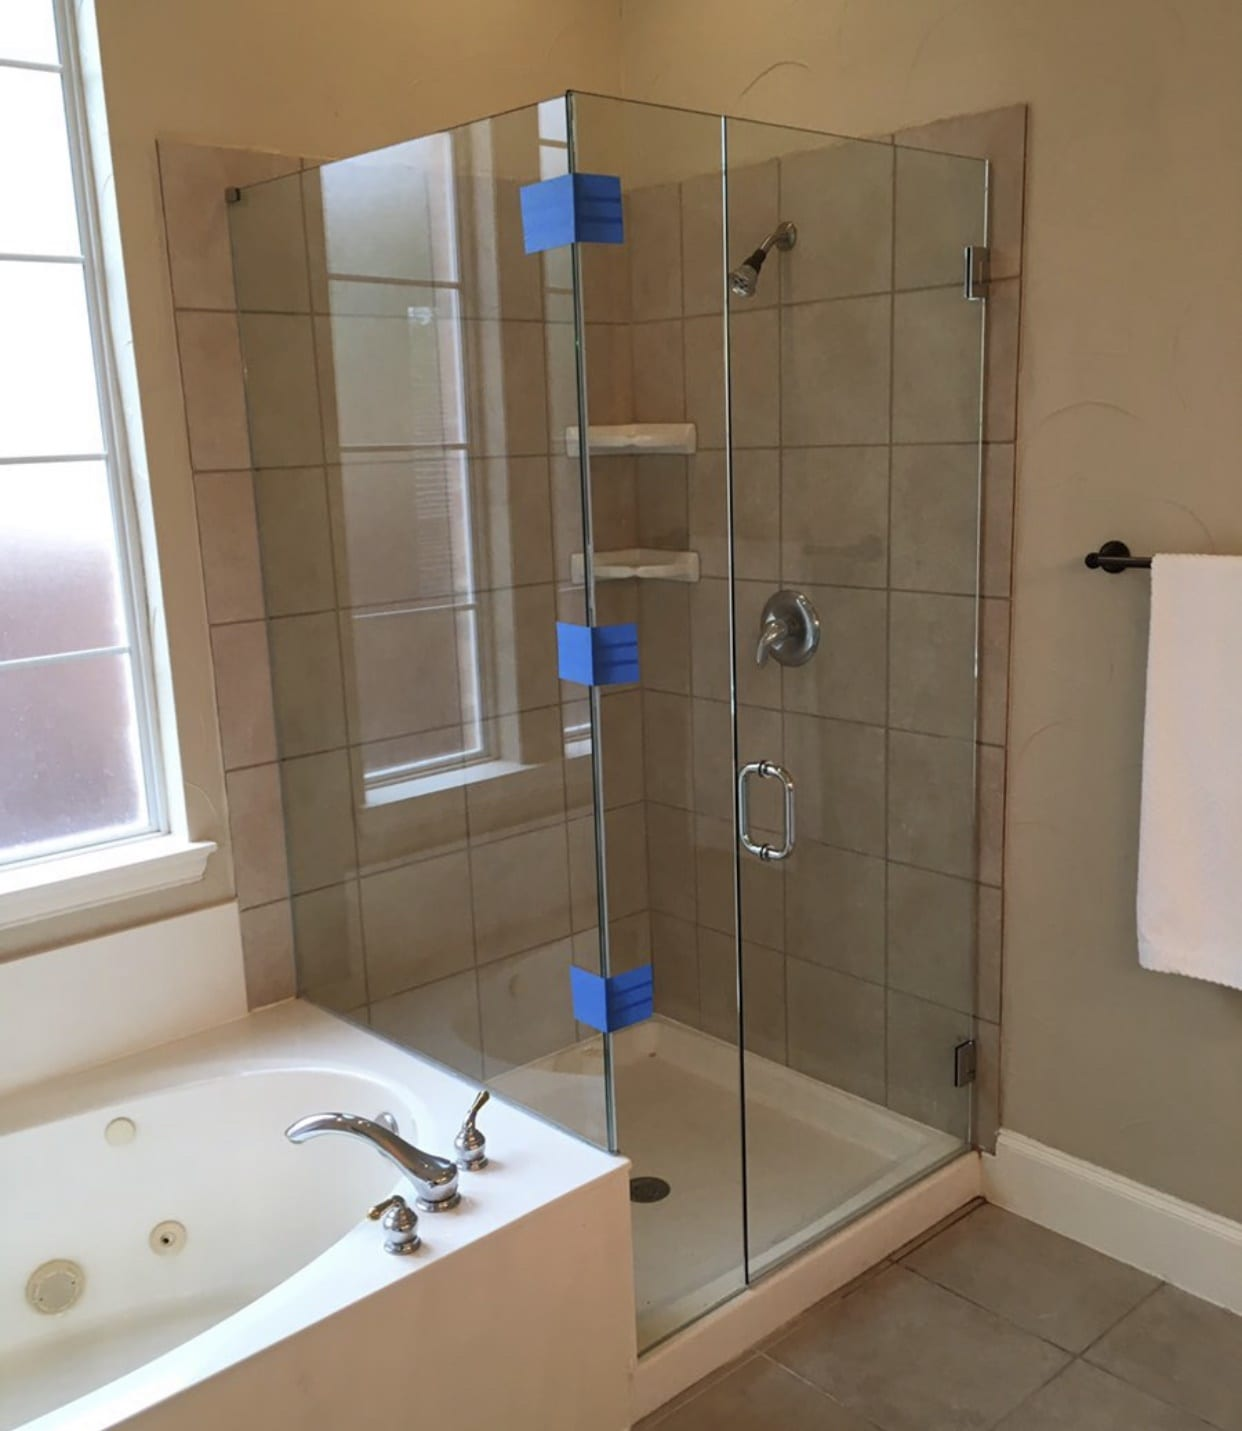 frameless shower doors img 2162 custom bathroom mirrors and decorative glass from Shower Doors of Nashville